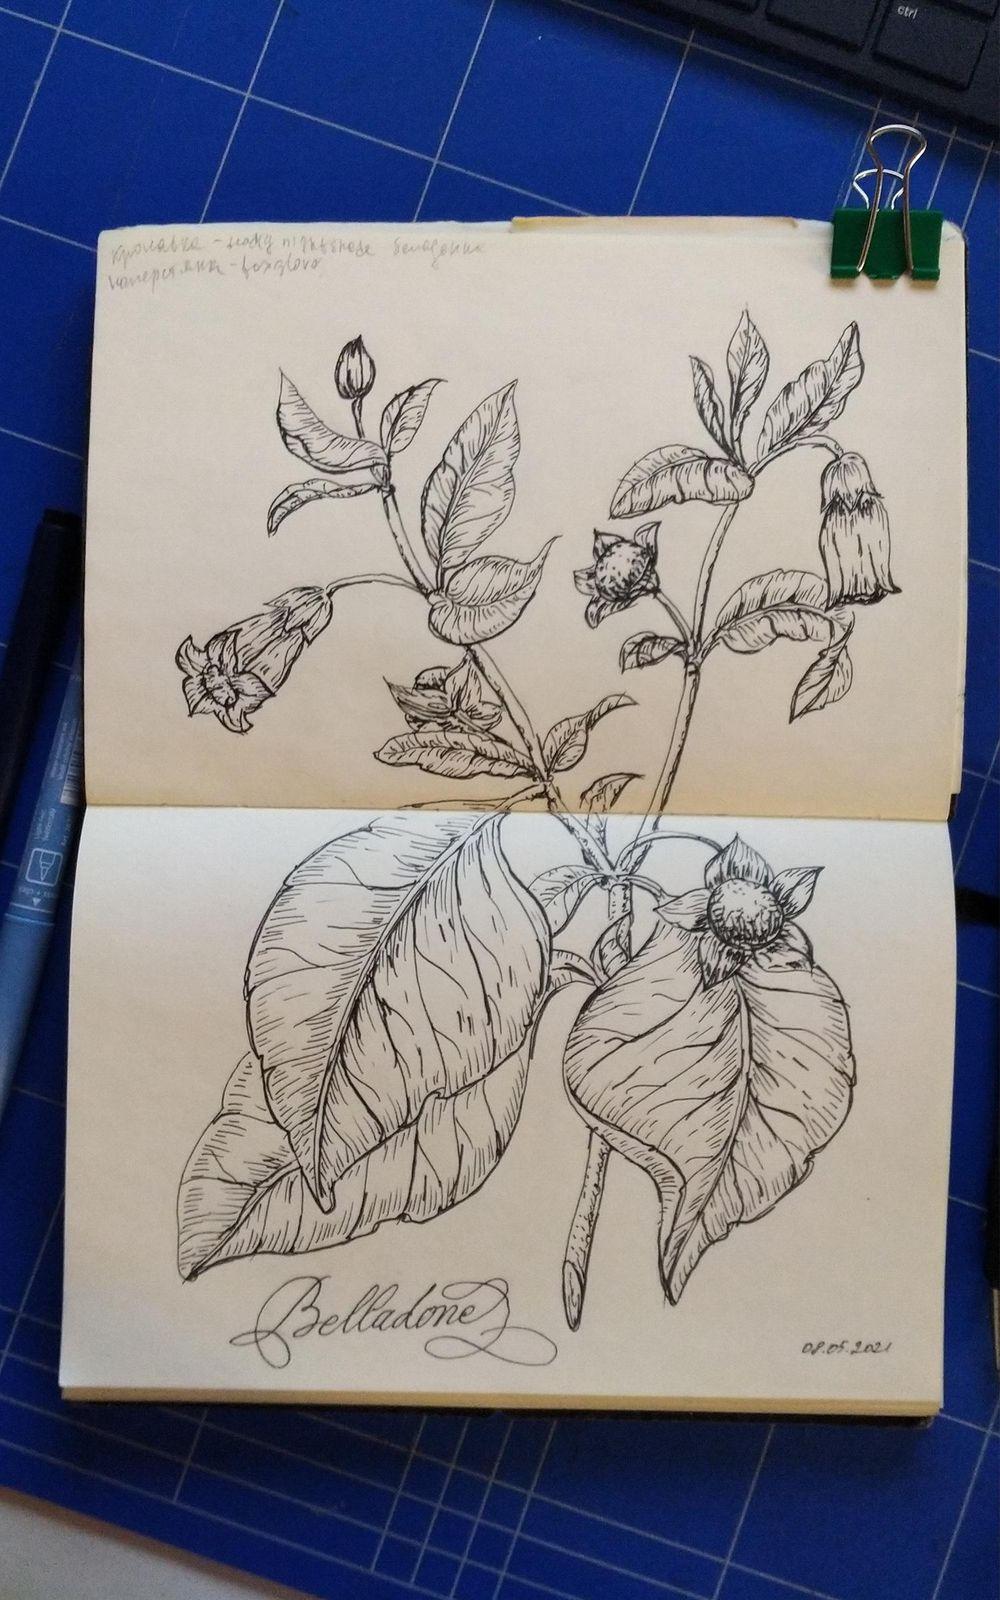 Poisonous Plants Line Drawing - image 1 - student project